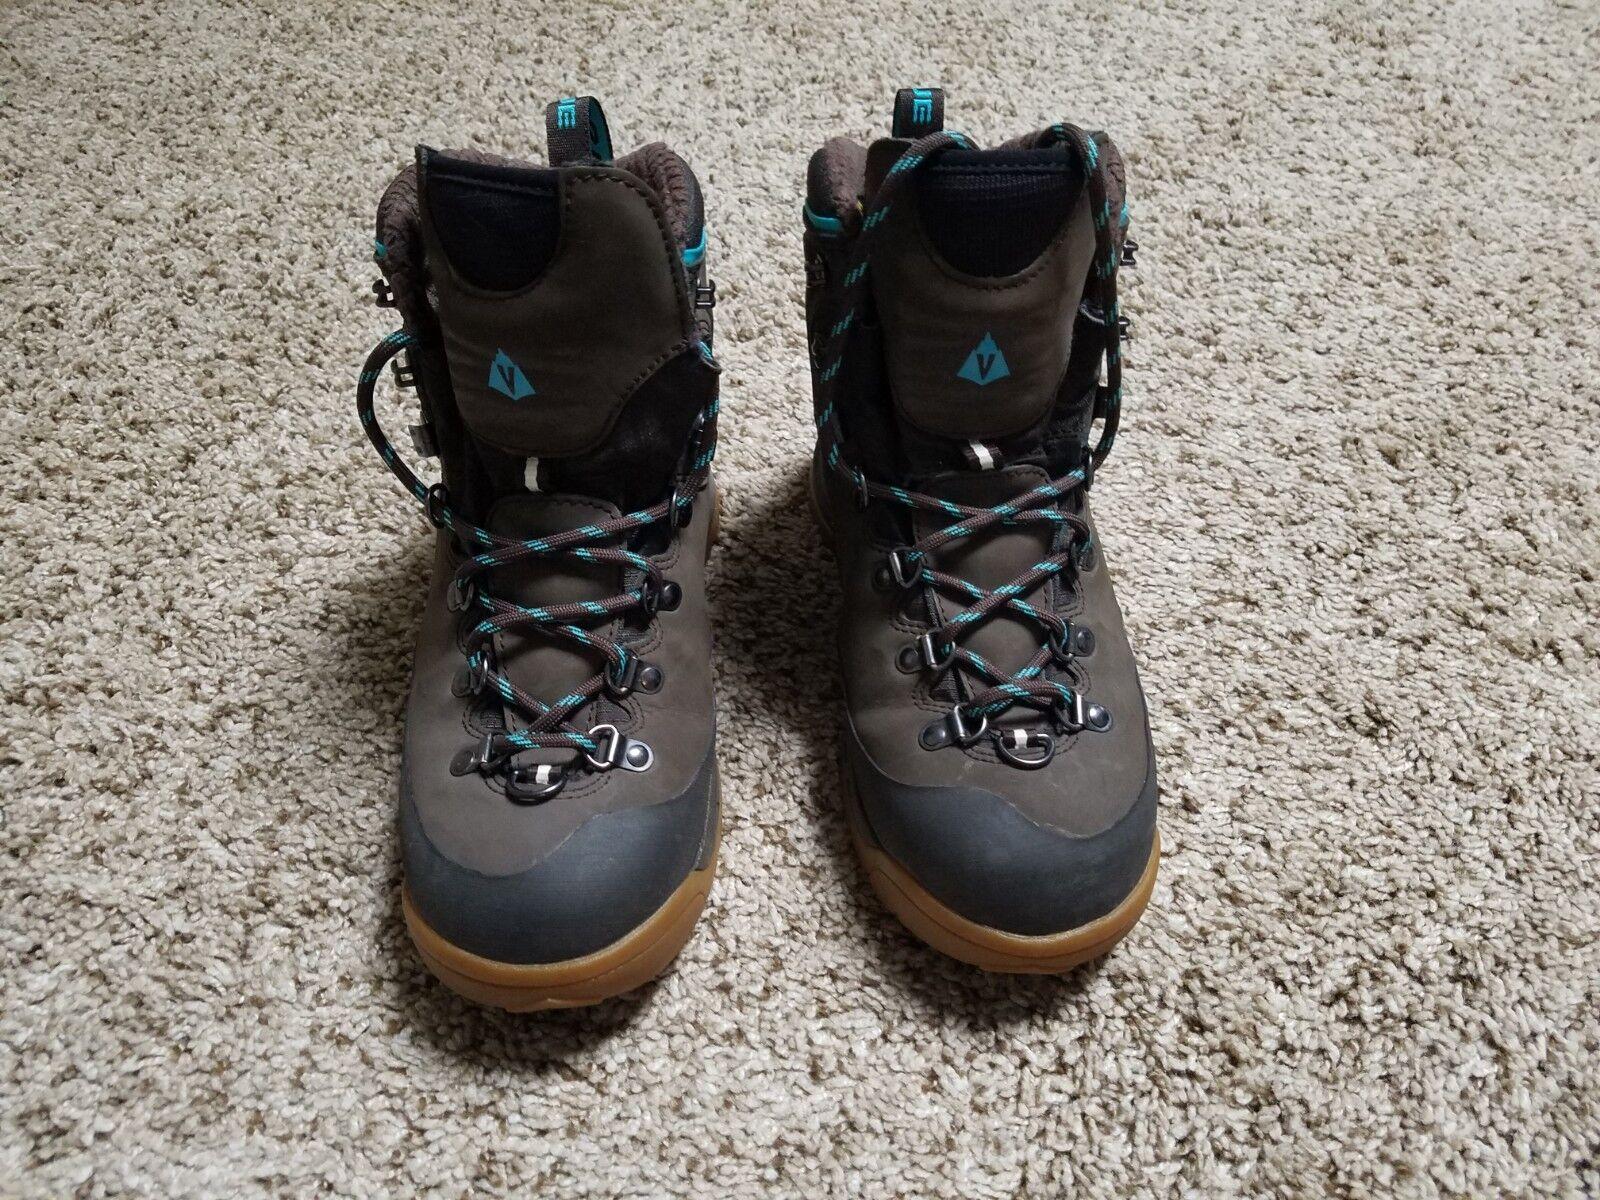 Women's Vasque Vasque Vasque Snowblime UltraDry Waterproof Insulated Hiking Boots Size 7.5 M 8571da